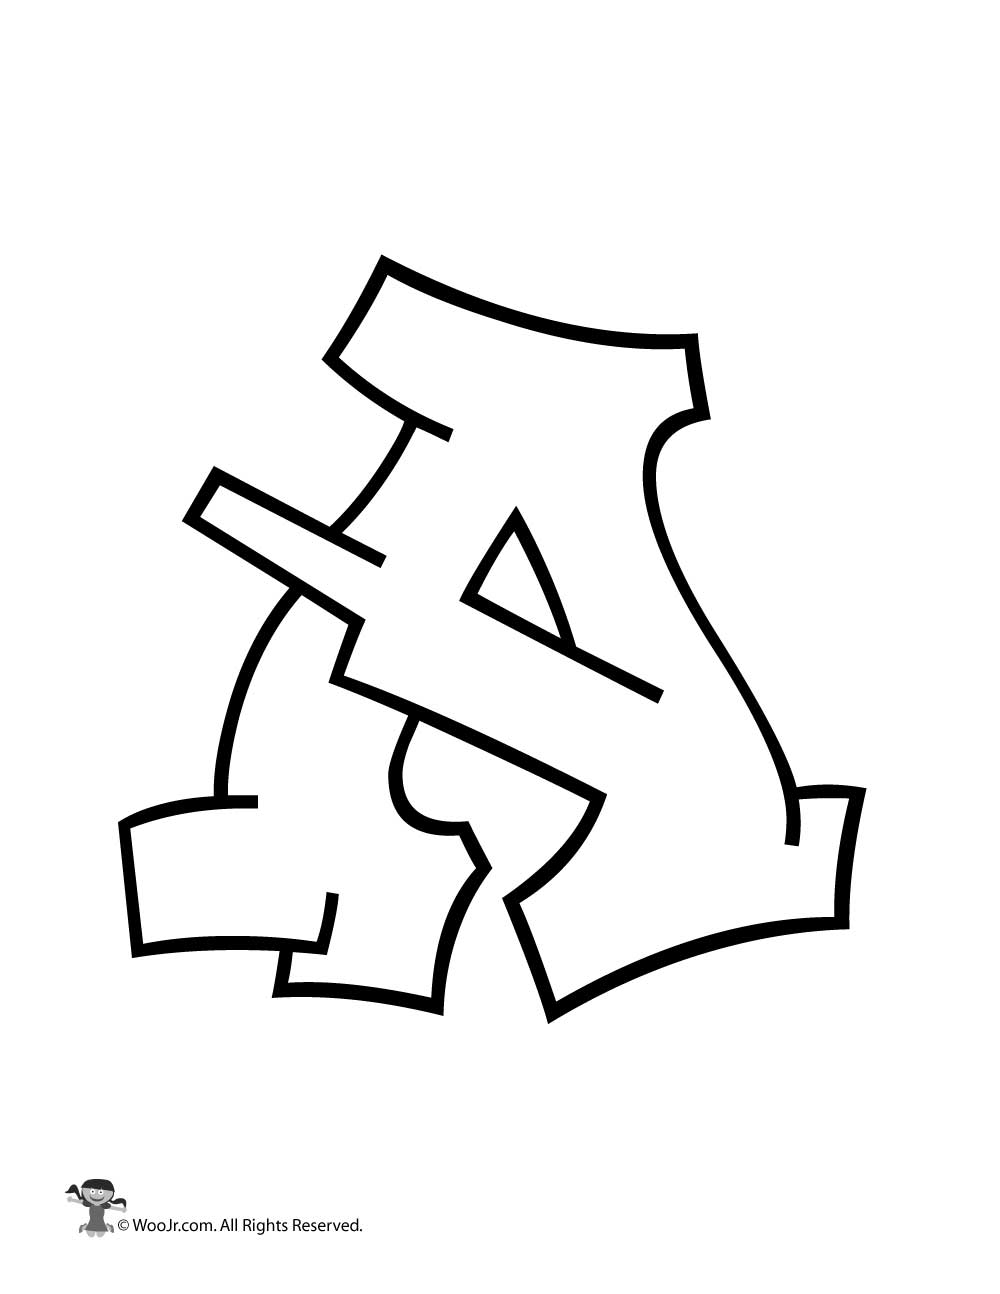 Graffiti Capital Letter A Woo Jr Kids Activities